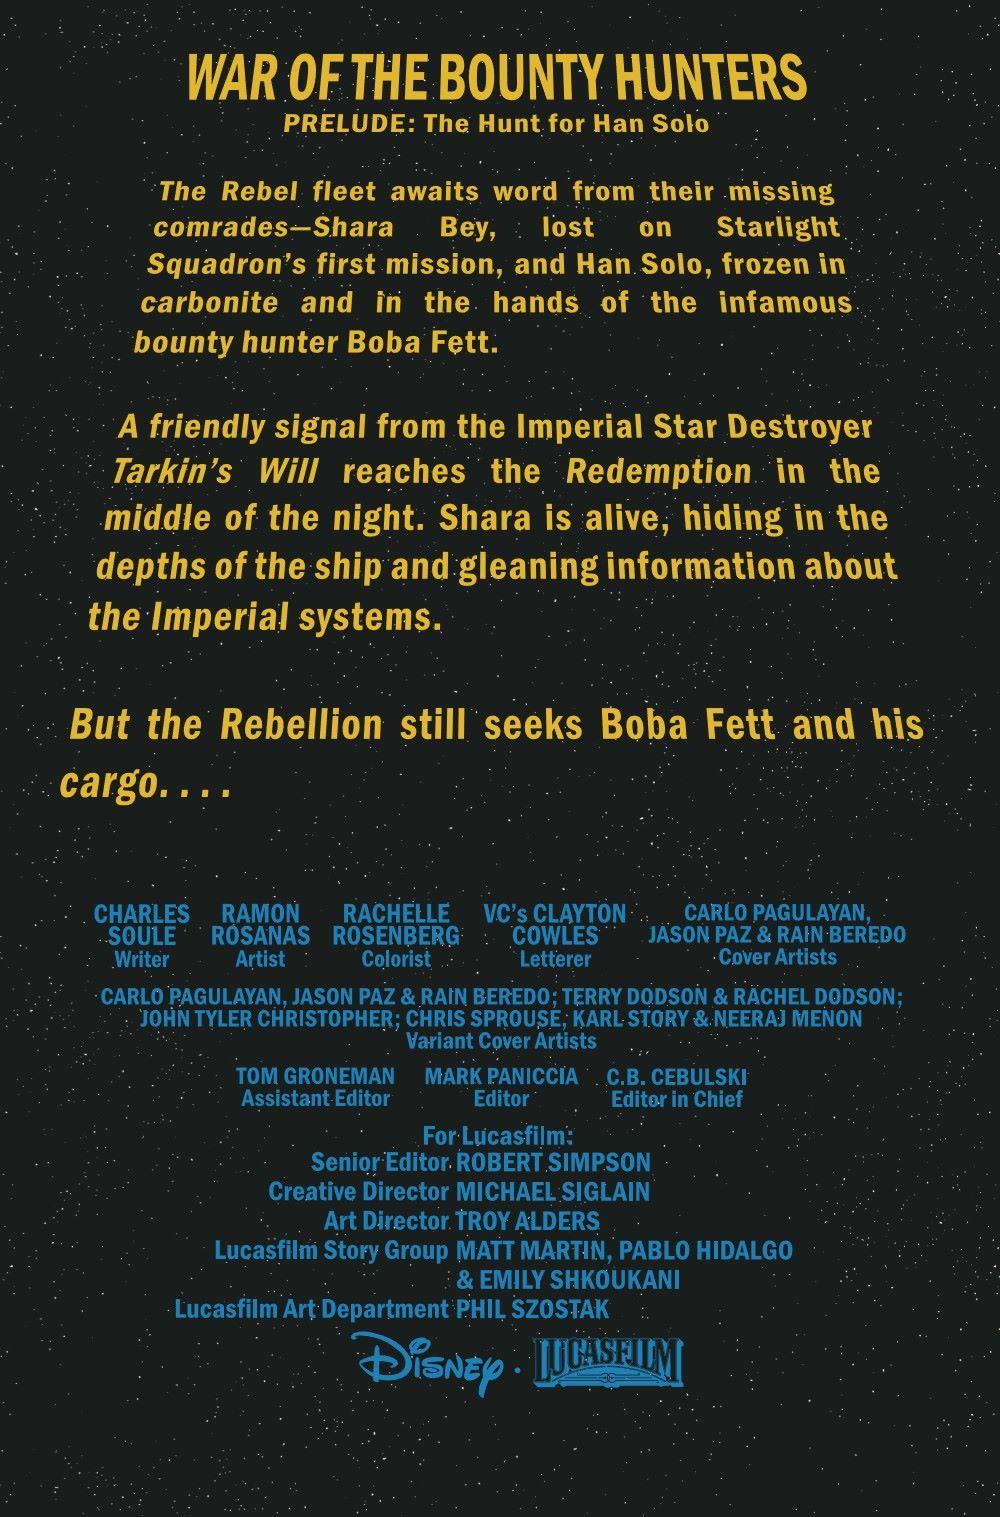 STWARS2020013_Preview-2 ComicList Previews: STAR WARS #13